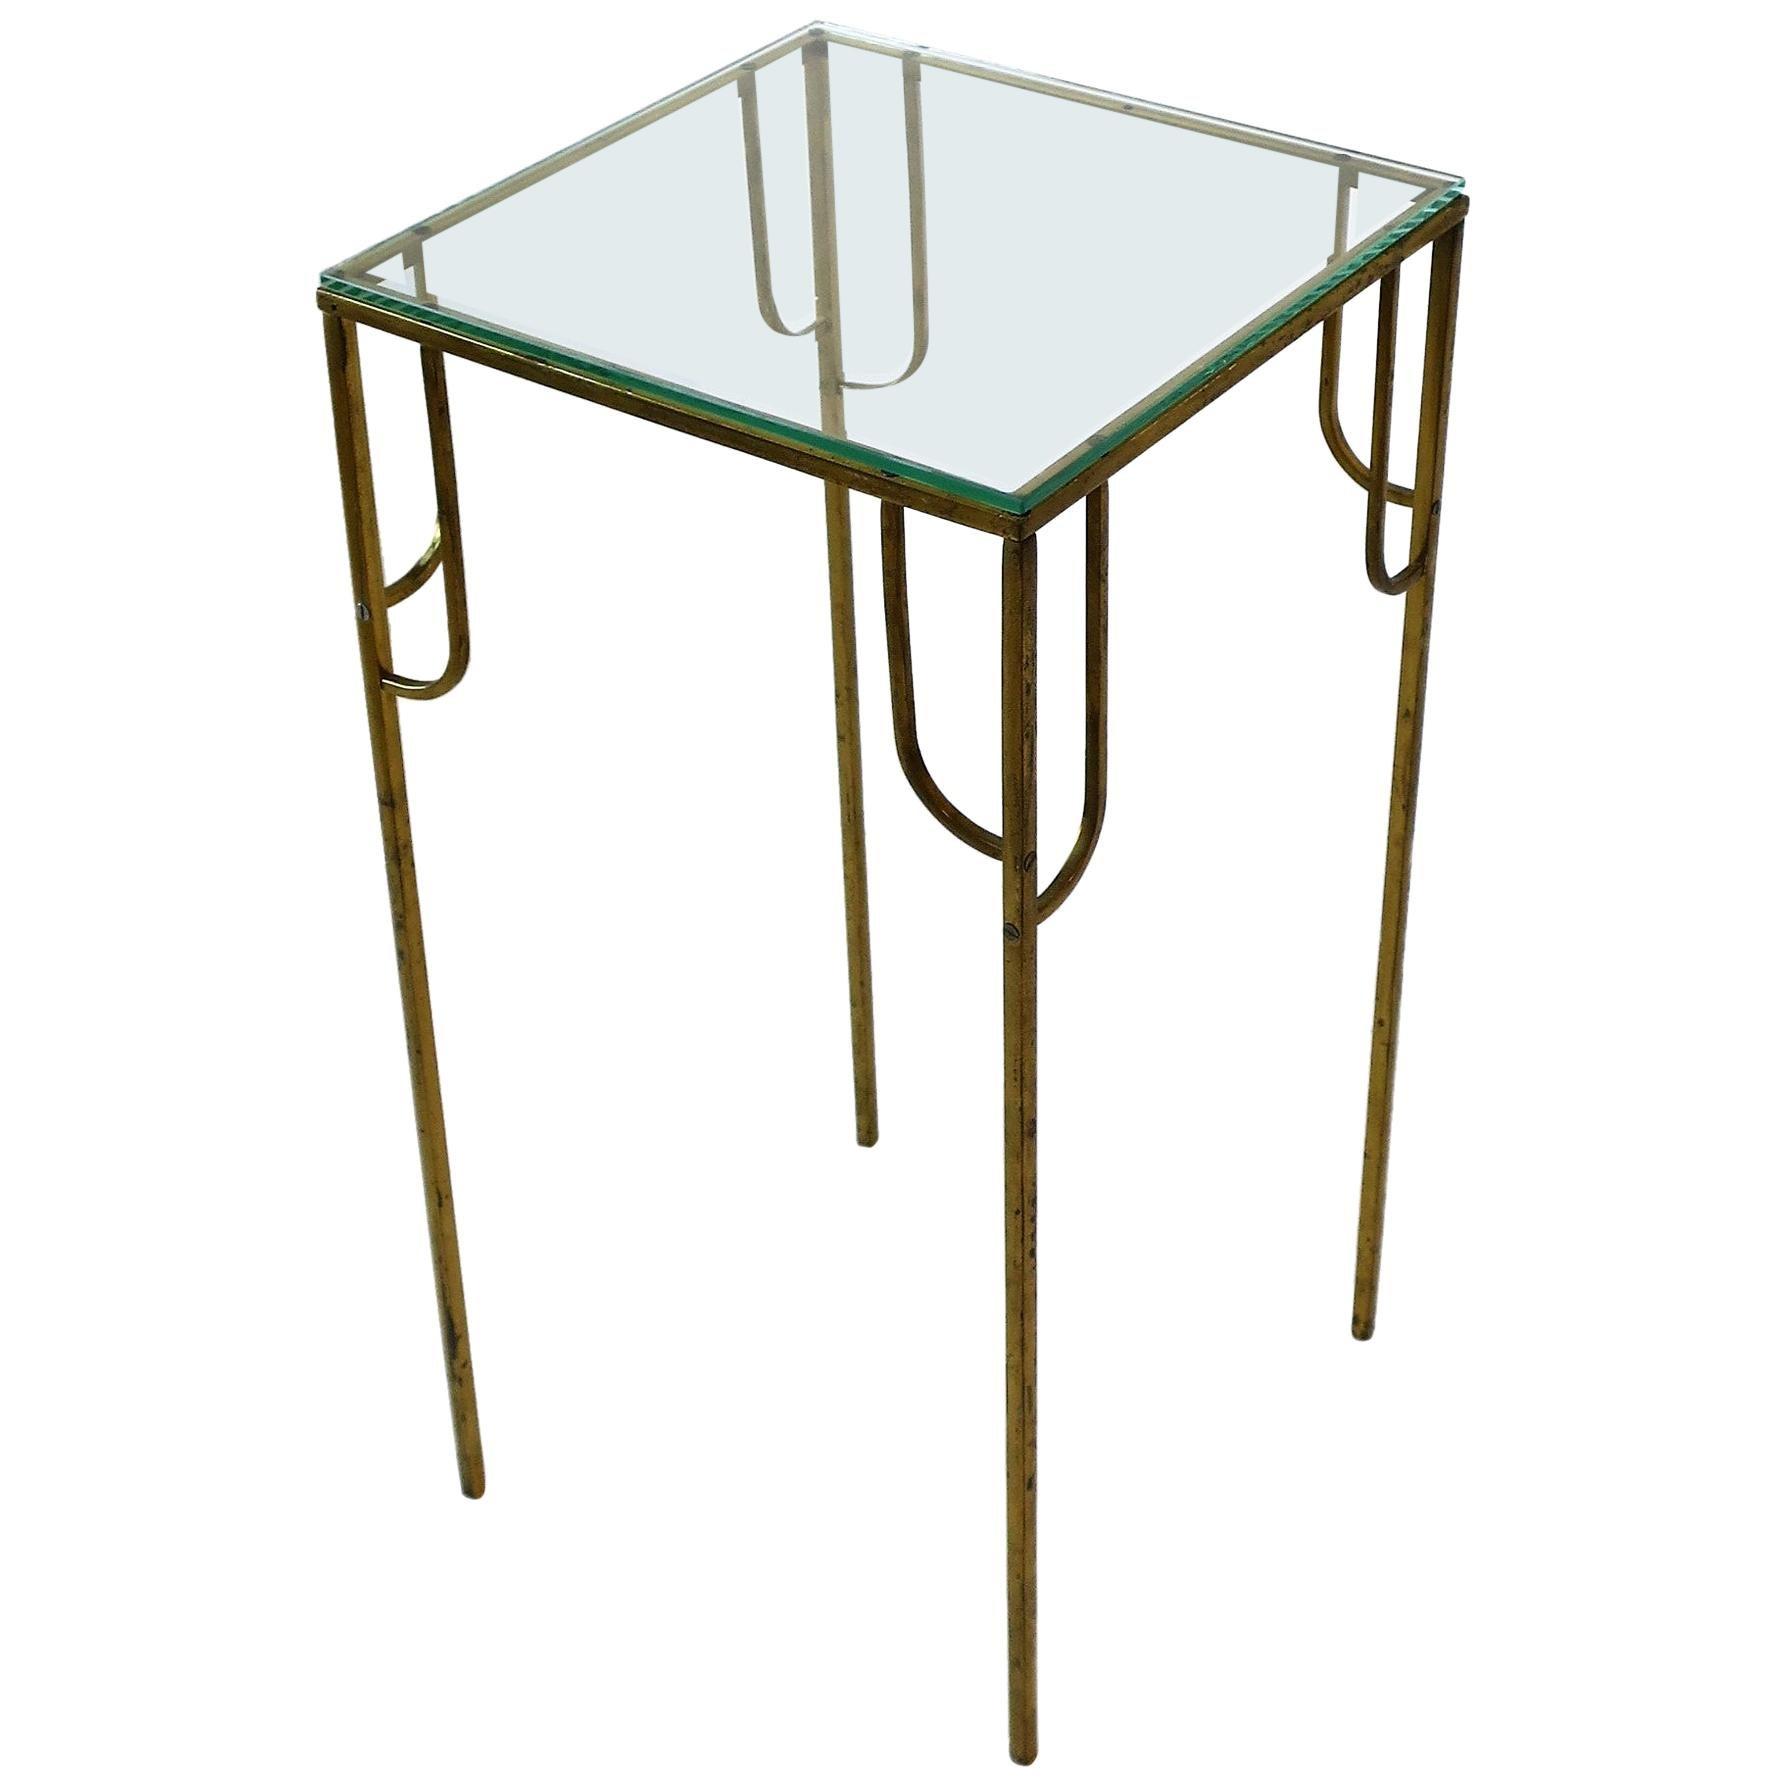 Modern Art Deco Brass and Glass Pedestal Table, 1970s